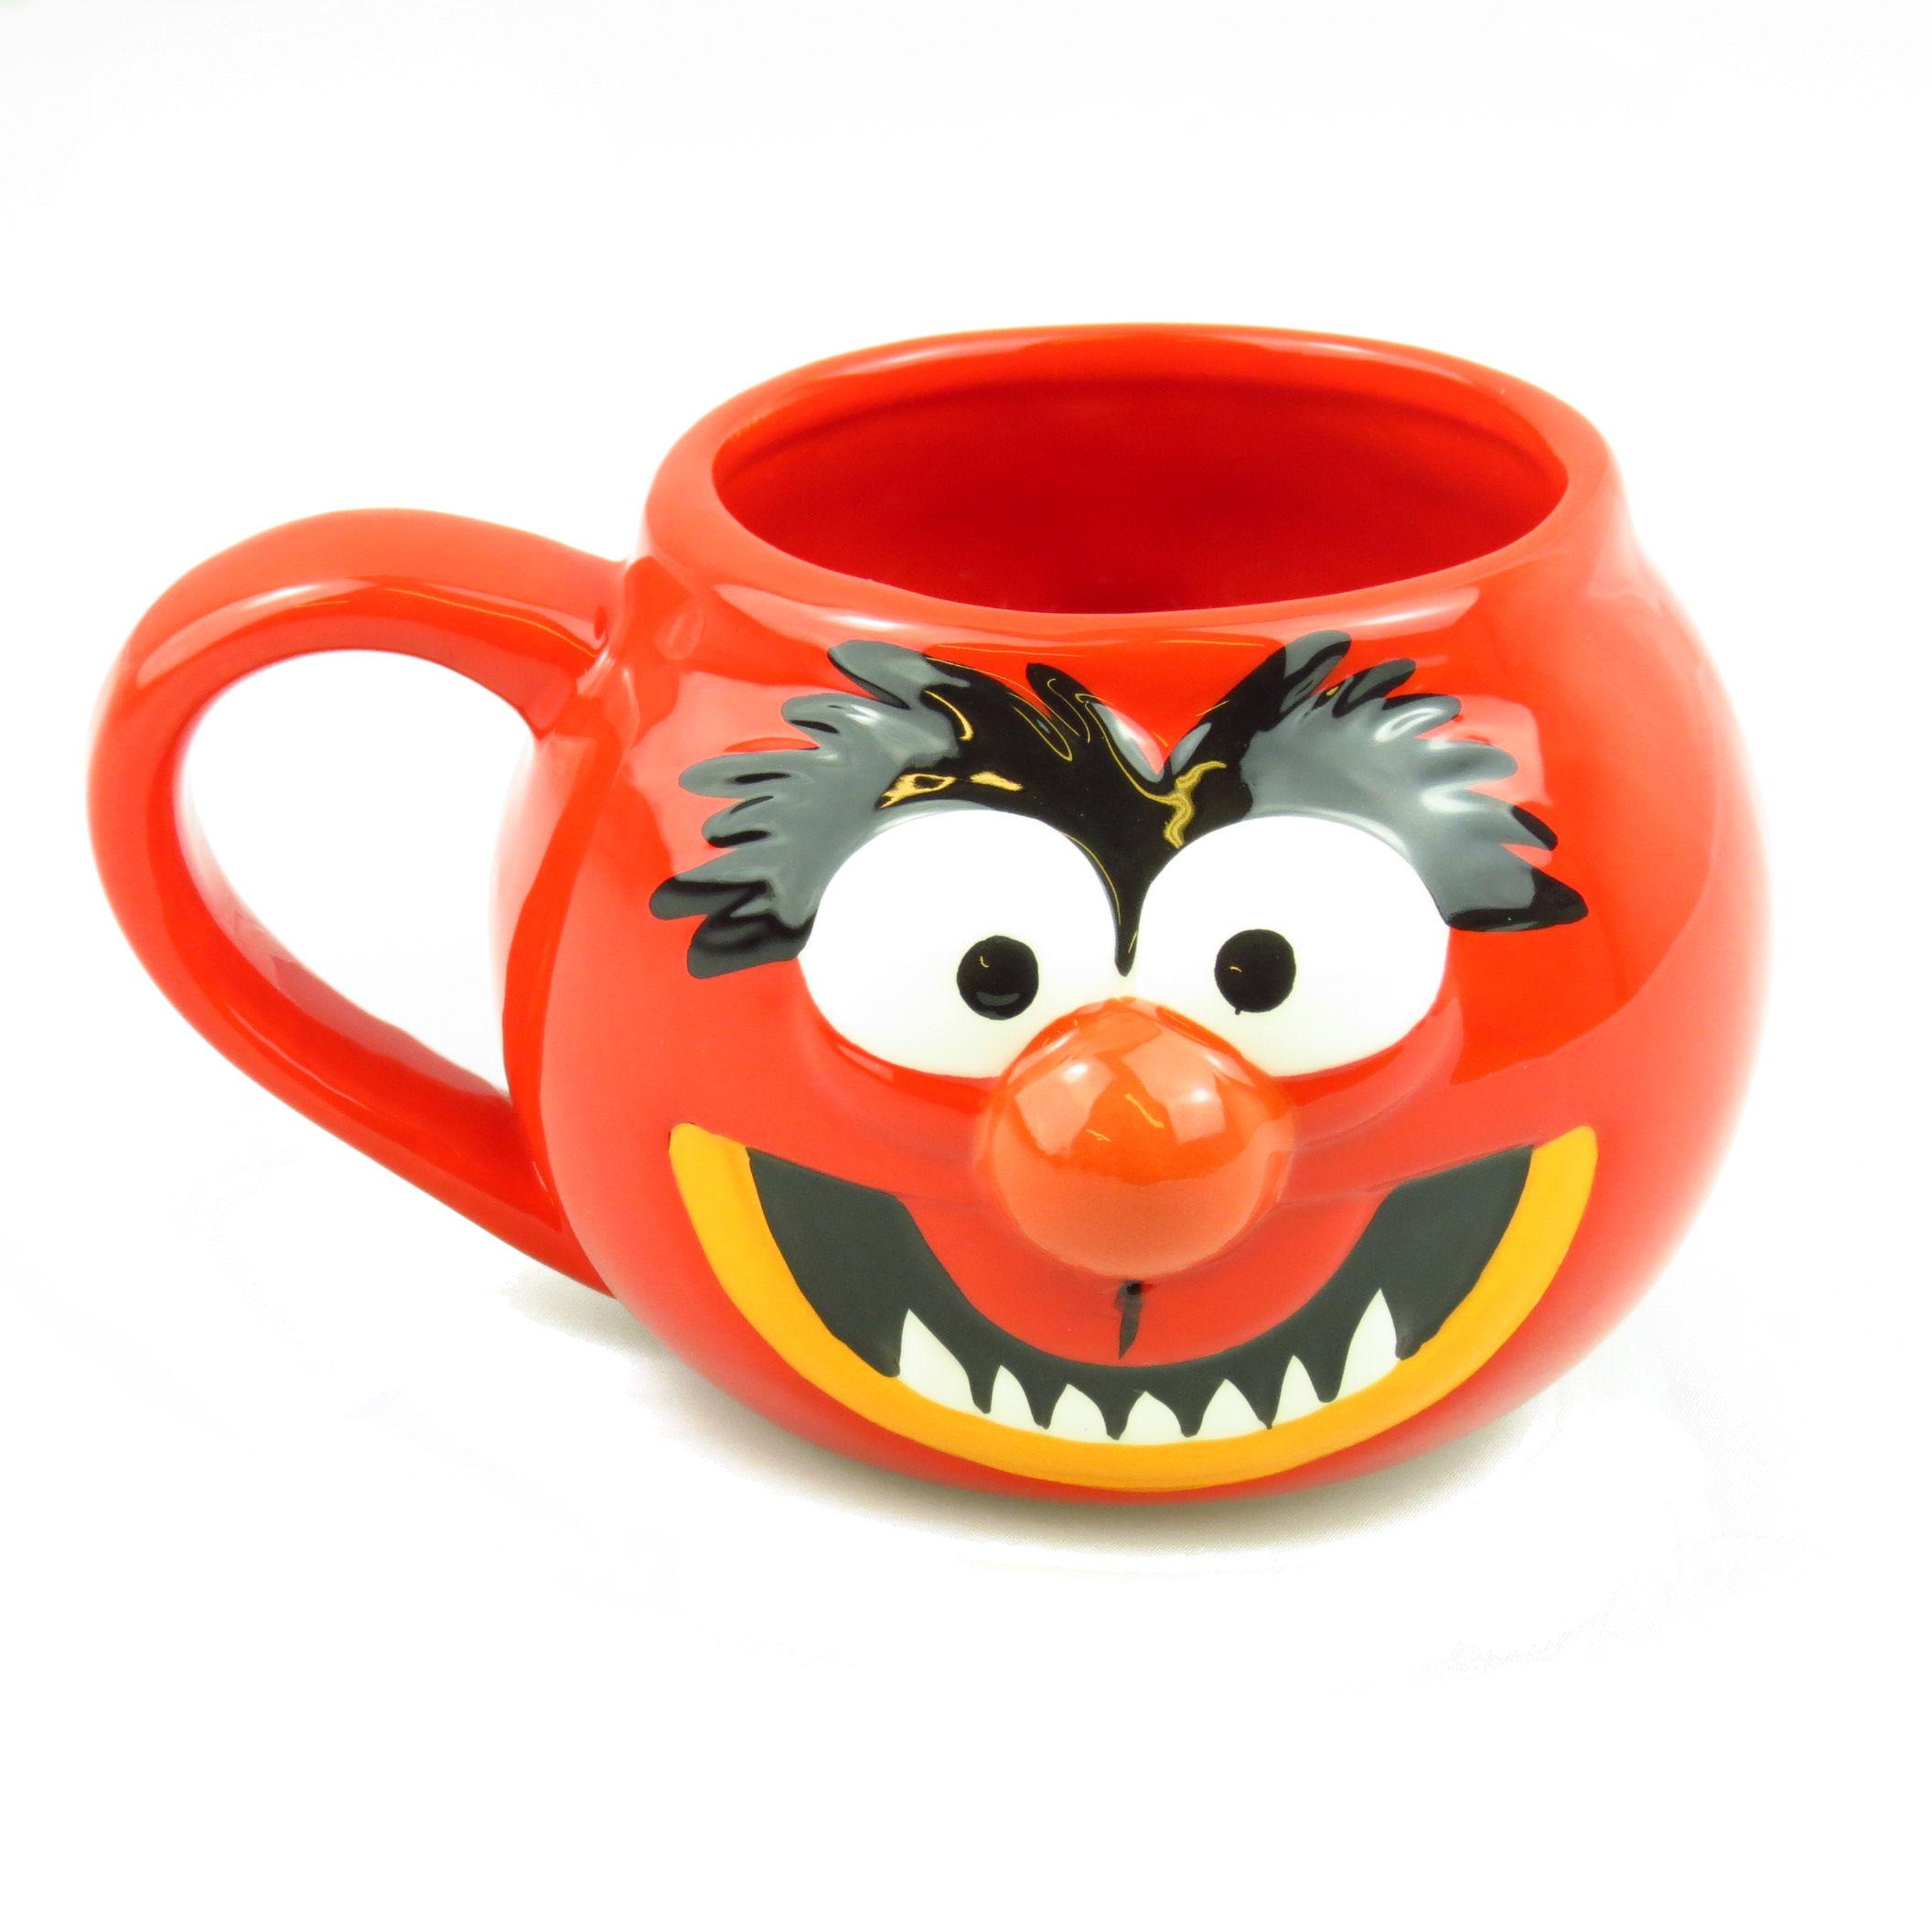 The muppets animal 3d shaped mug standard kitschagogo for Animal shaped mugs